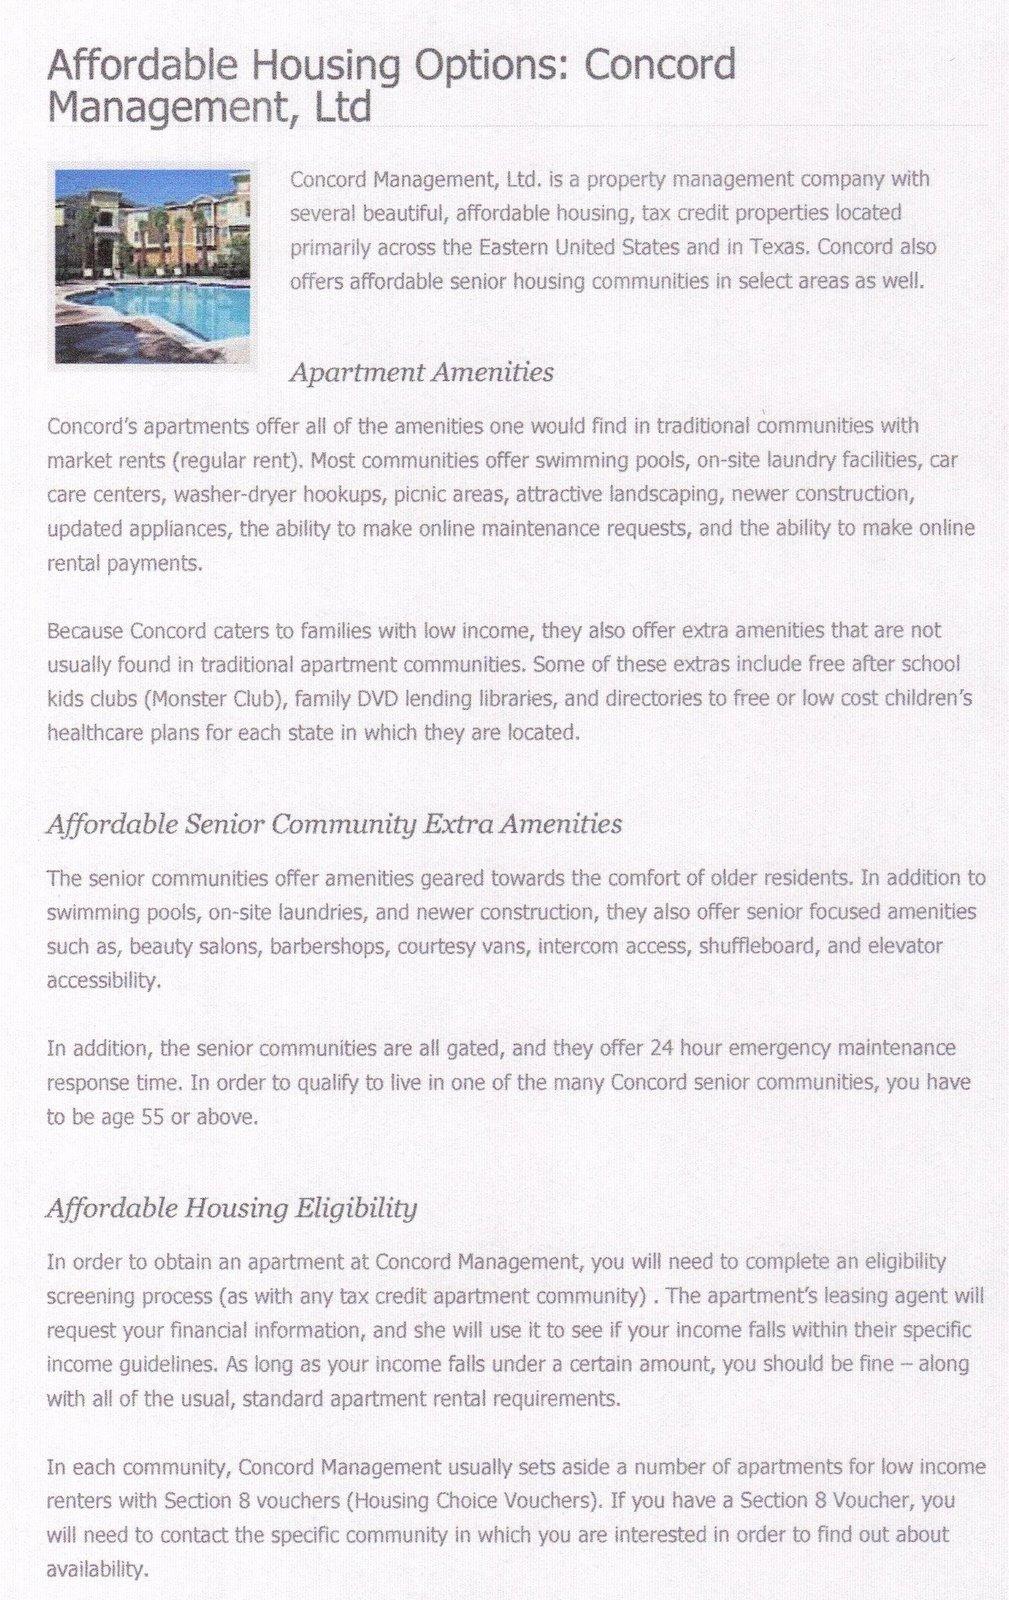 nautilus cove condominium you don 39 t live in a condo you. Black Bedroom Furniture Sets. Home Design Ideas